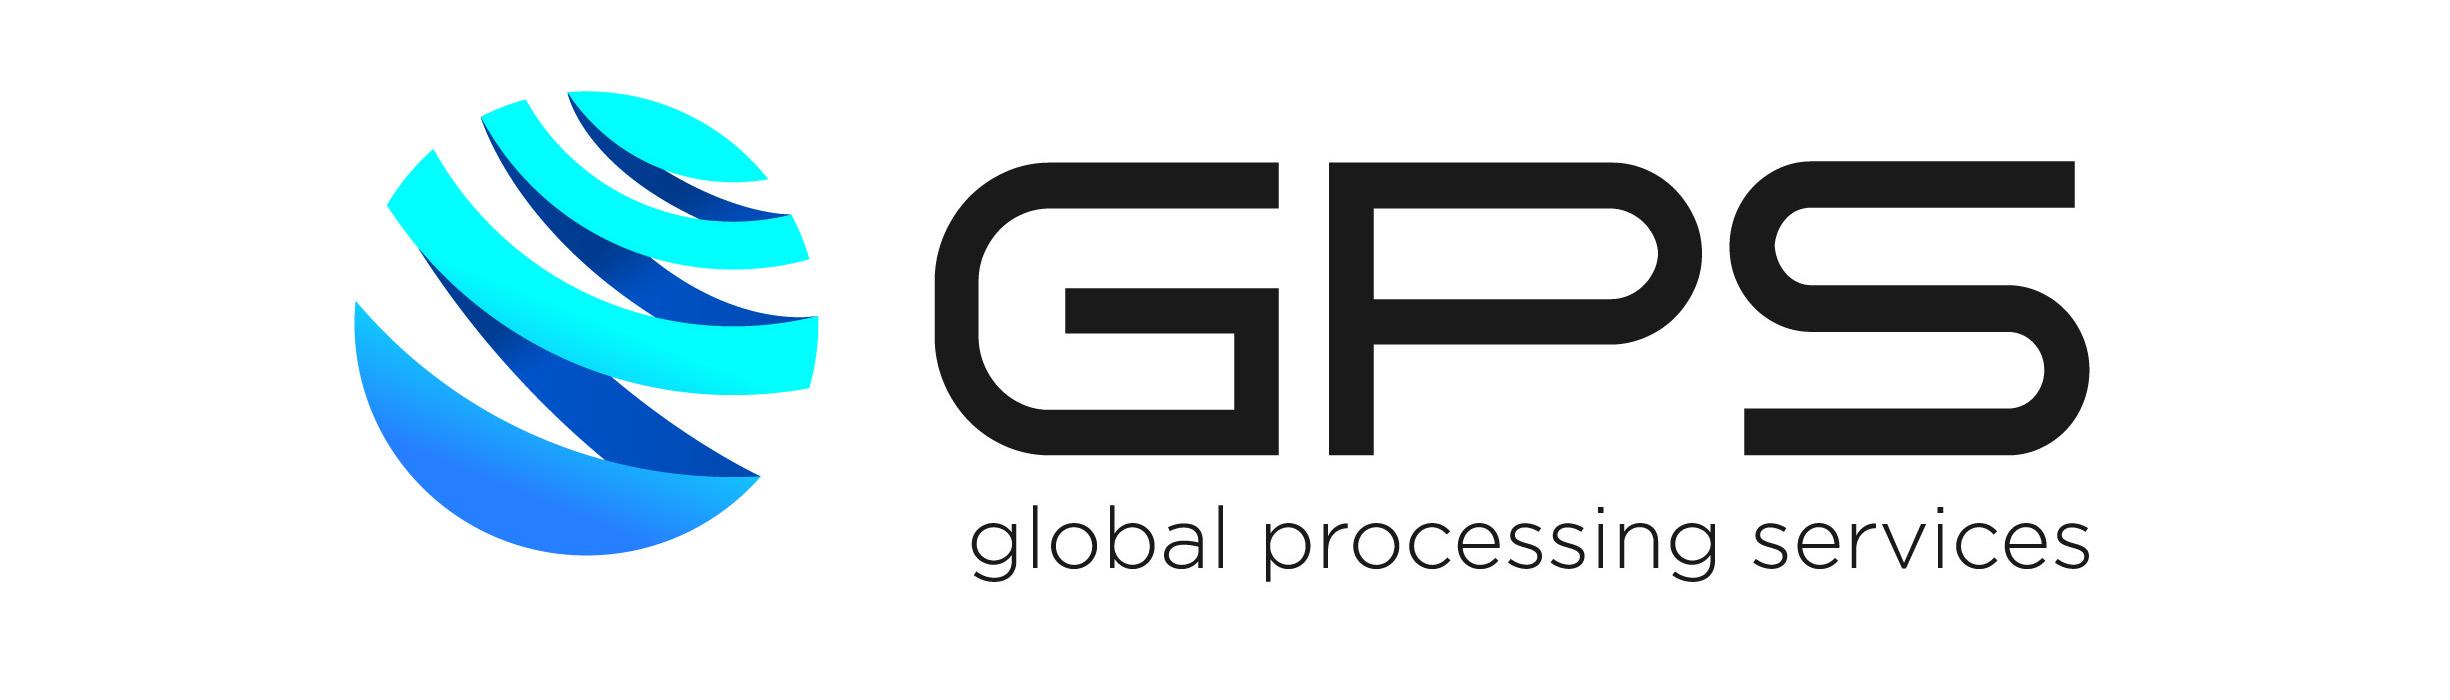 Lanistar Taps GPS to Launch Gen-Z Targeted Polymorphic Debit Card